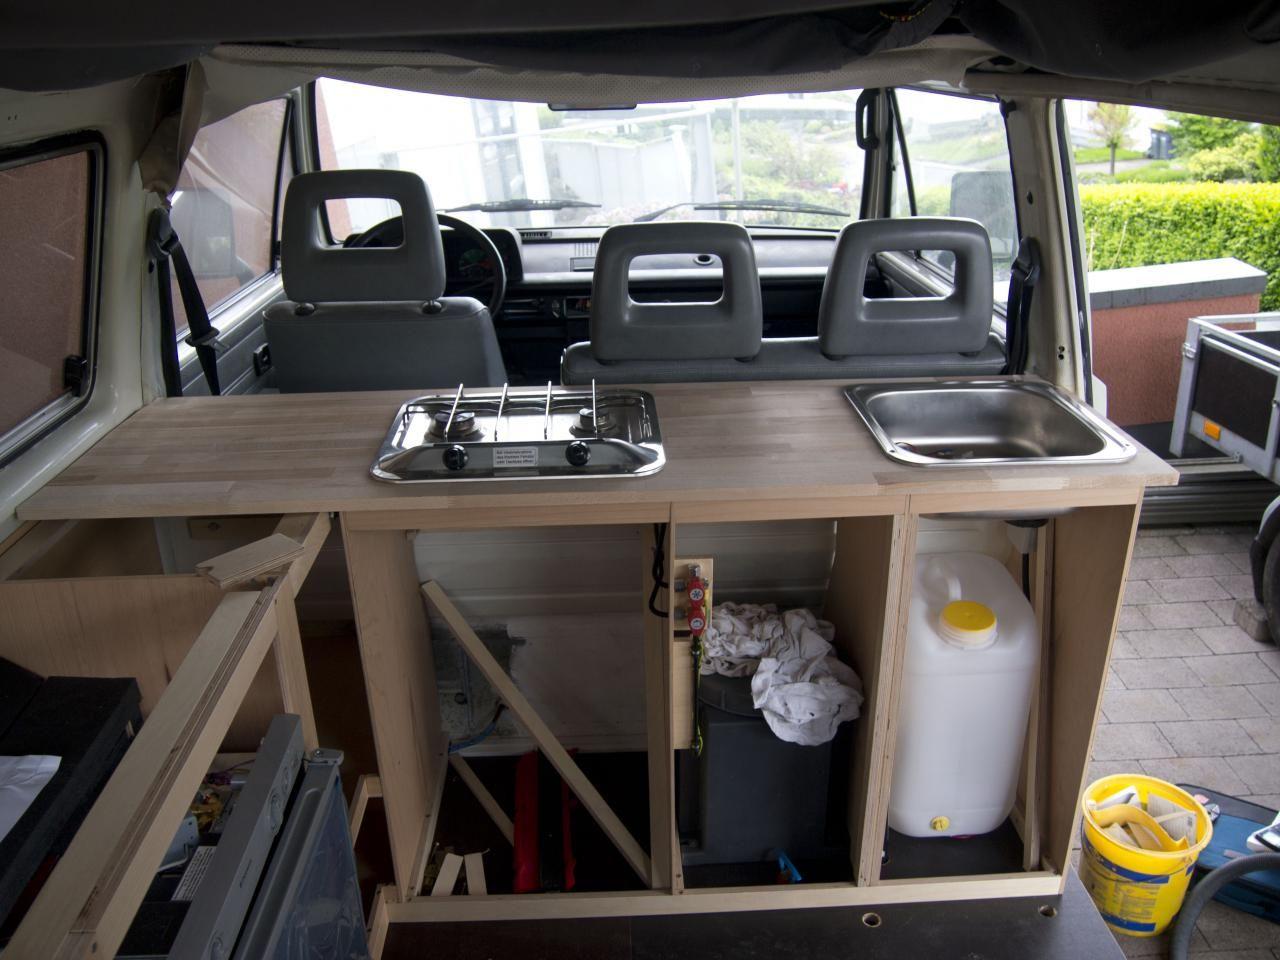 waschbecken kanister buspl ne campingbus ausbau. Black Bedroom Furniture Sets. Home Design Ideas